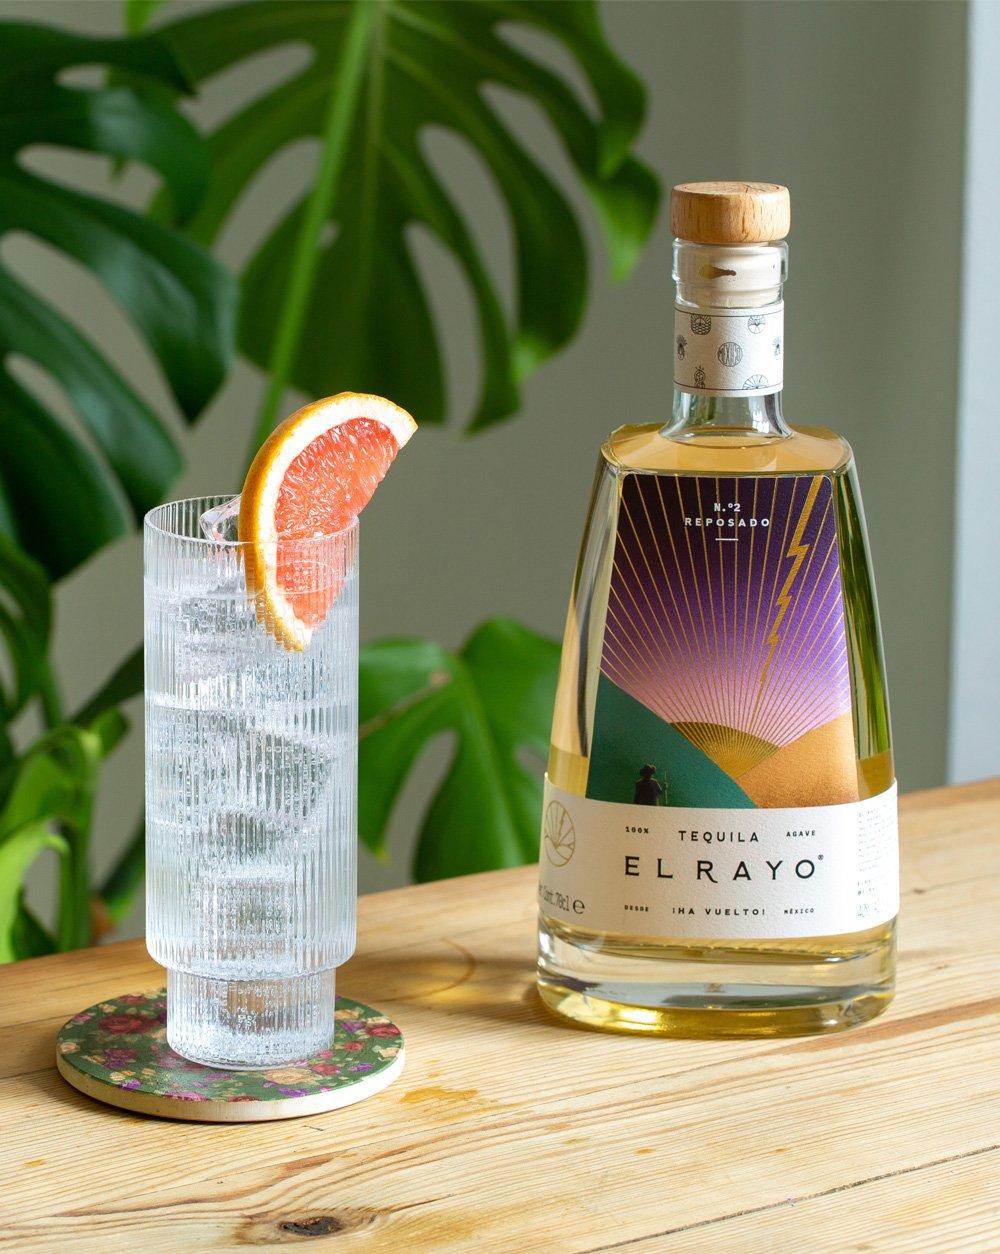 El Rayo Tequila- Feel the Lightning